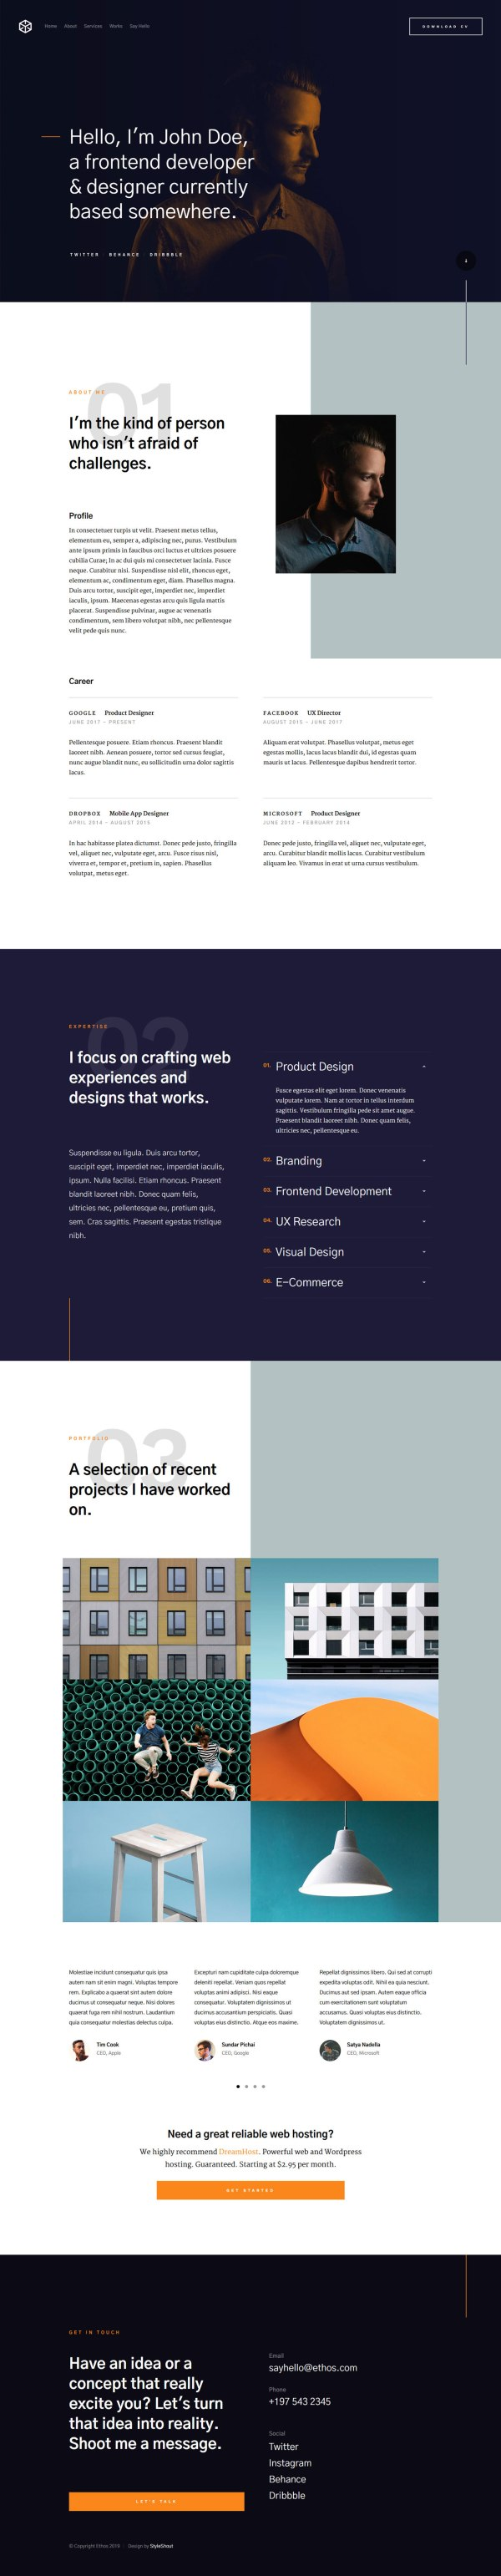 Ethos — Modern Free Resume Website Template 02